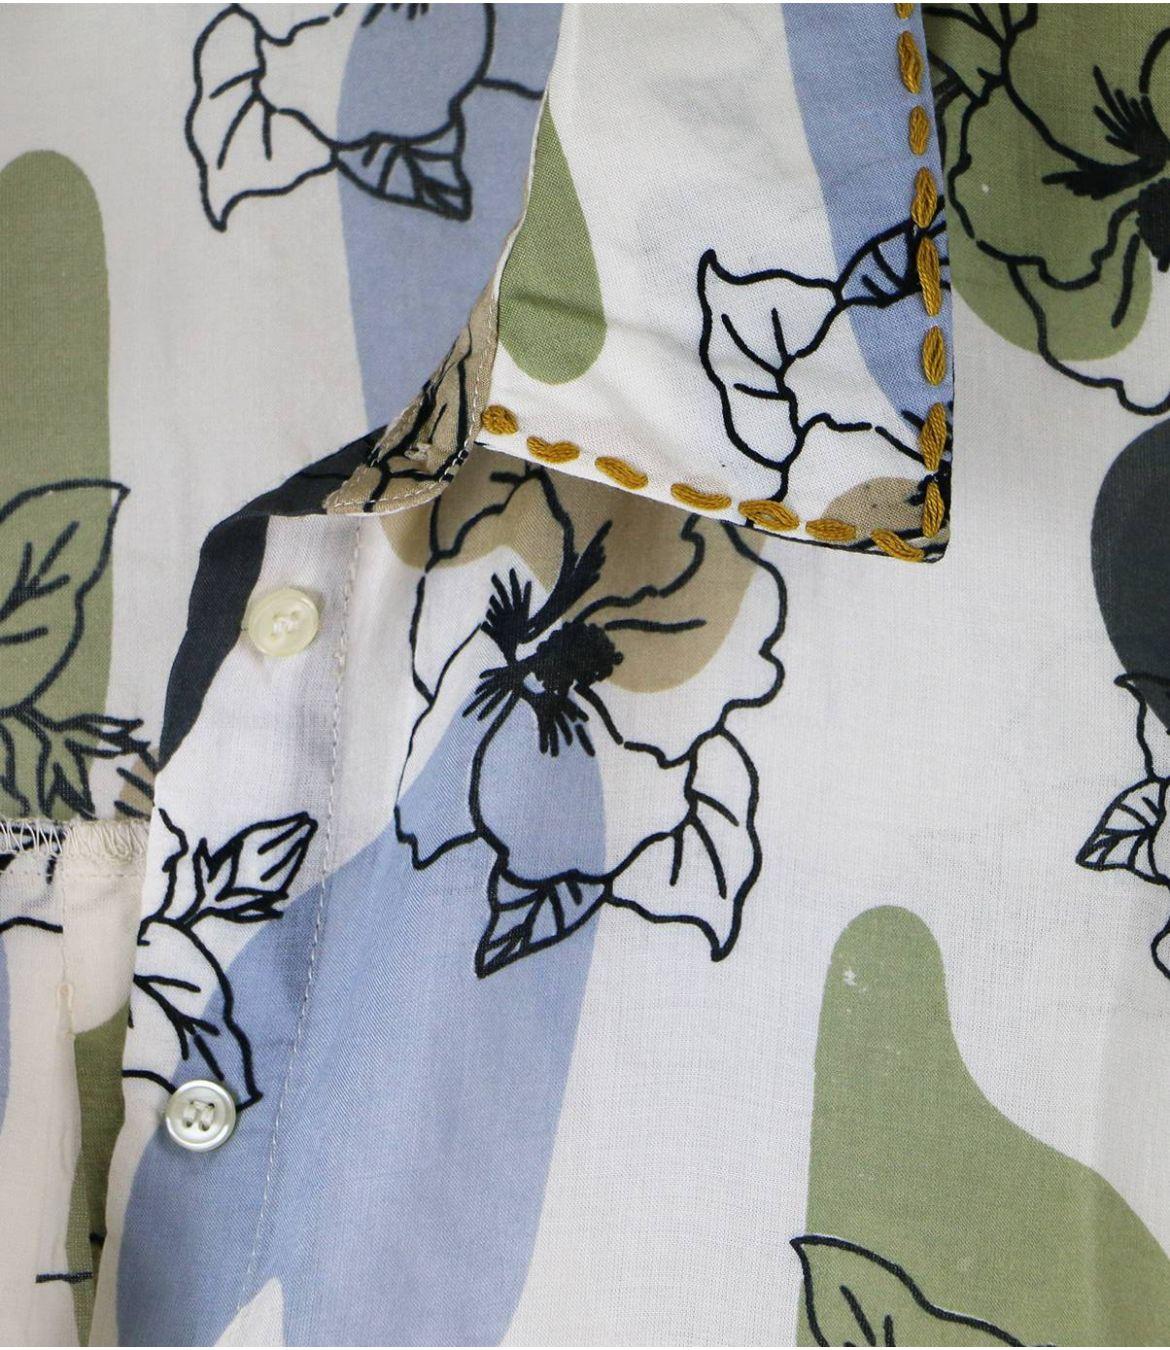 KAIA VANYA Women's Modal Dress Storiatipic - 2